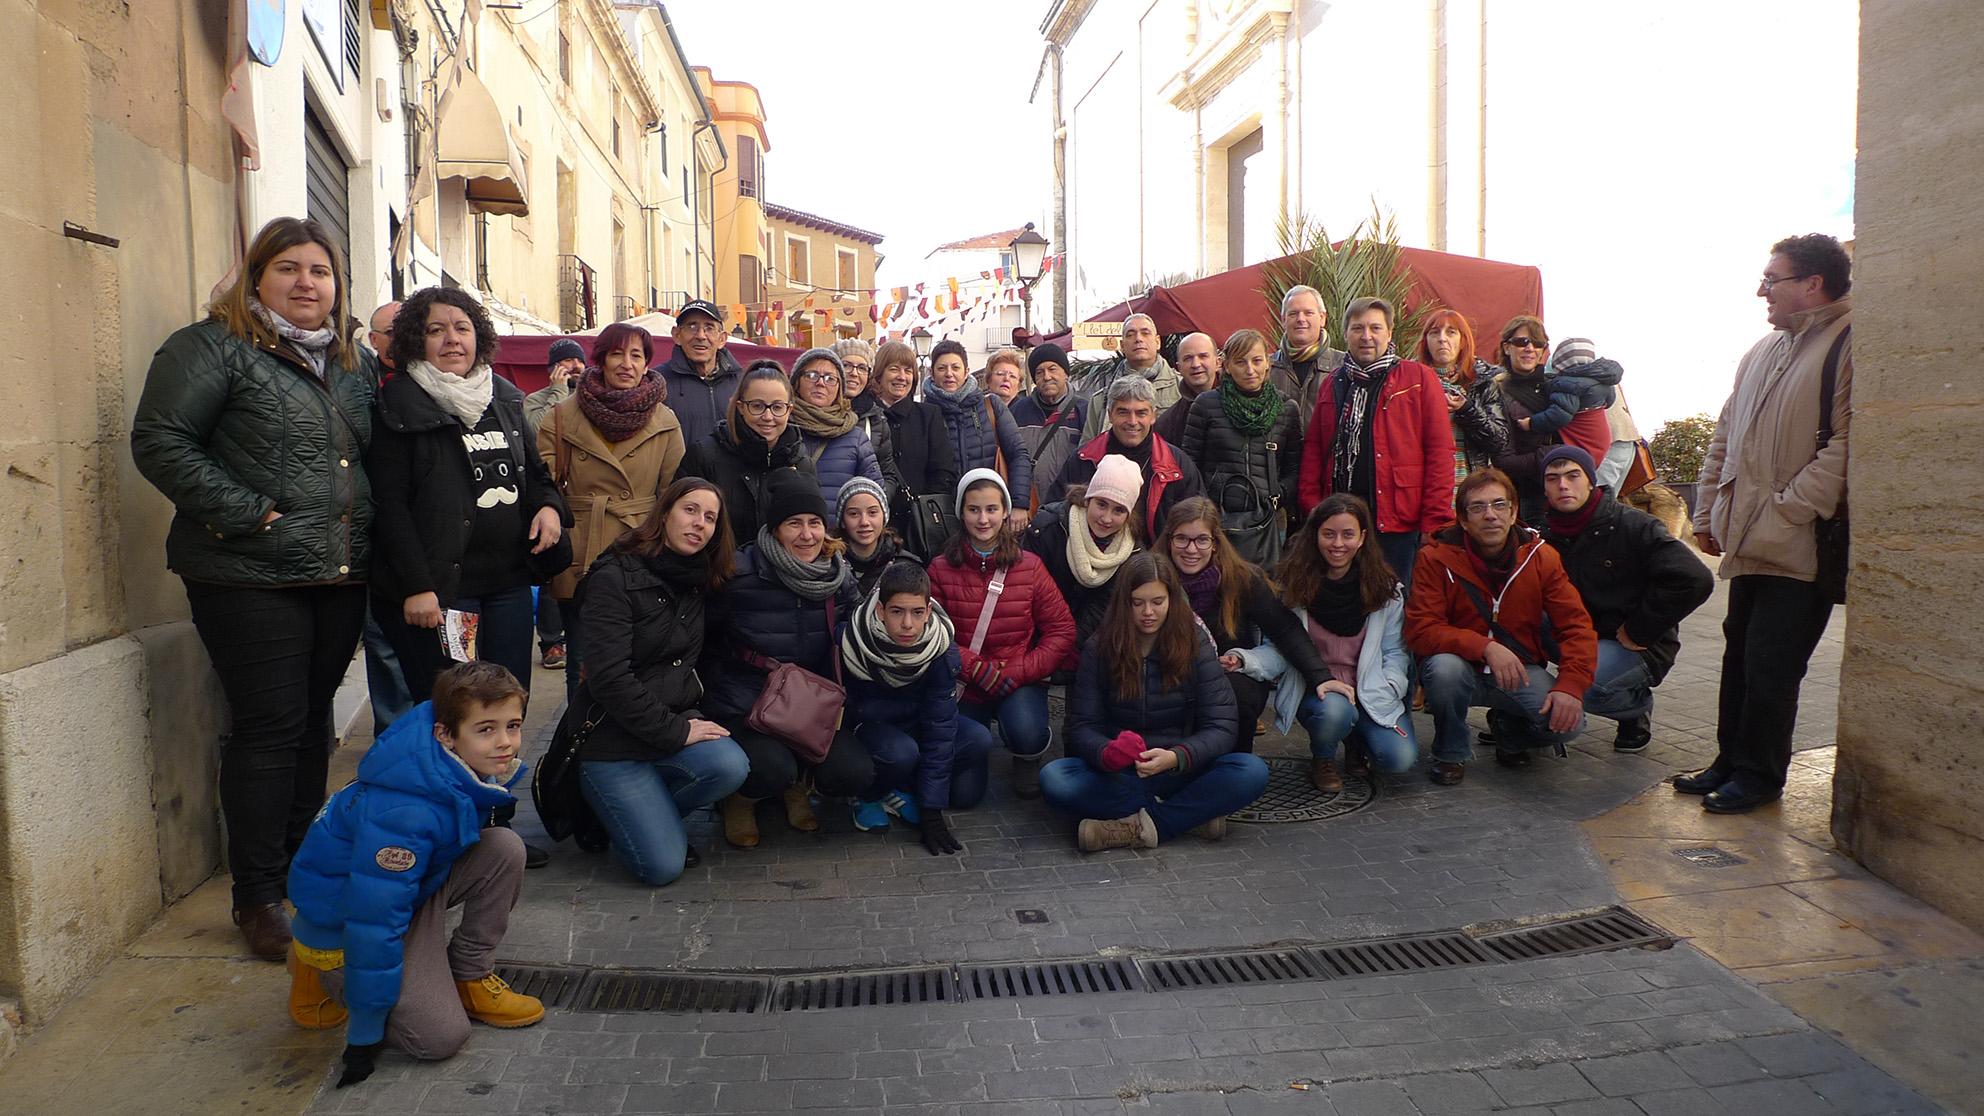 2015-01-17i18 Fireta St. Antoni MURO 2015 (16)